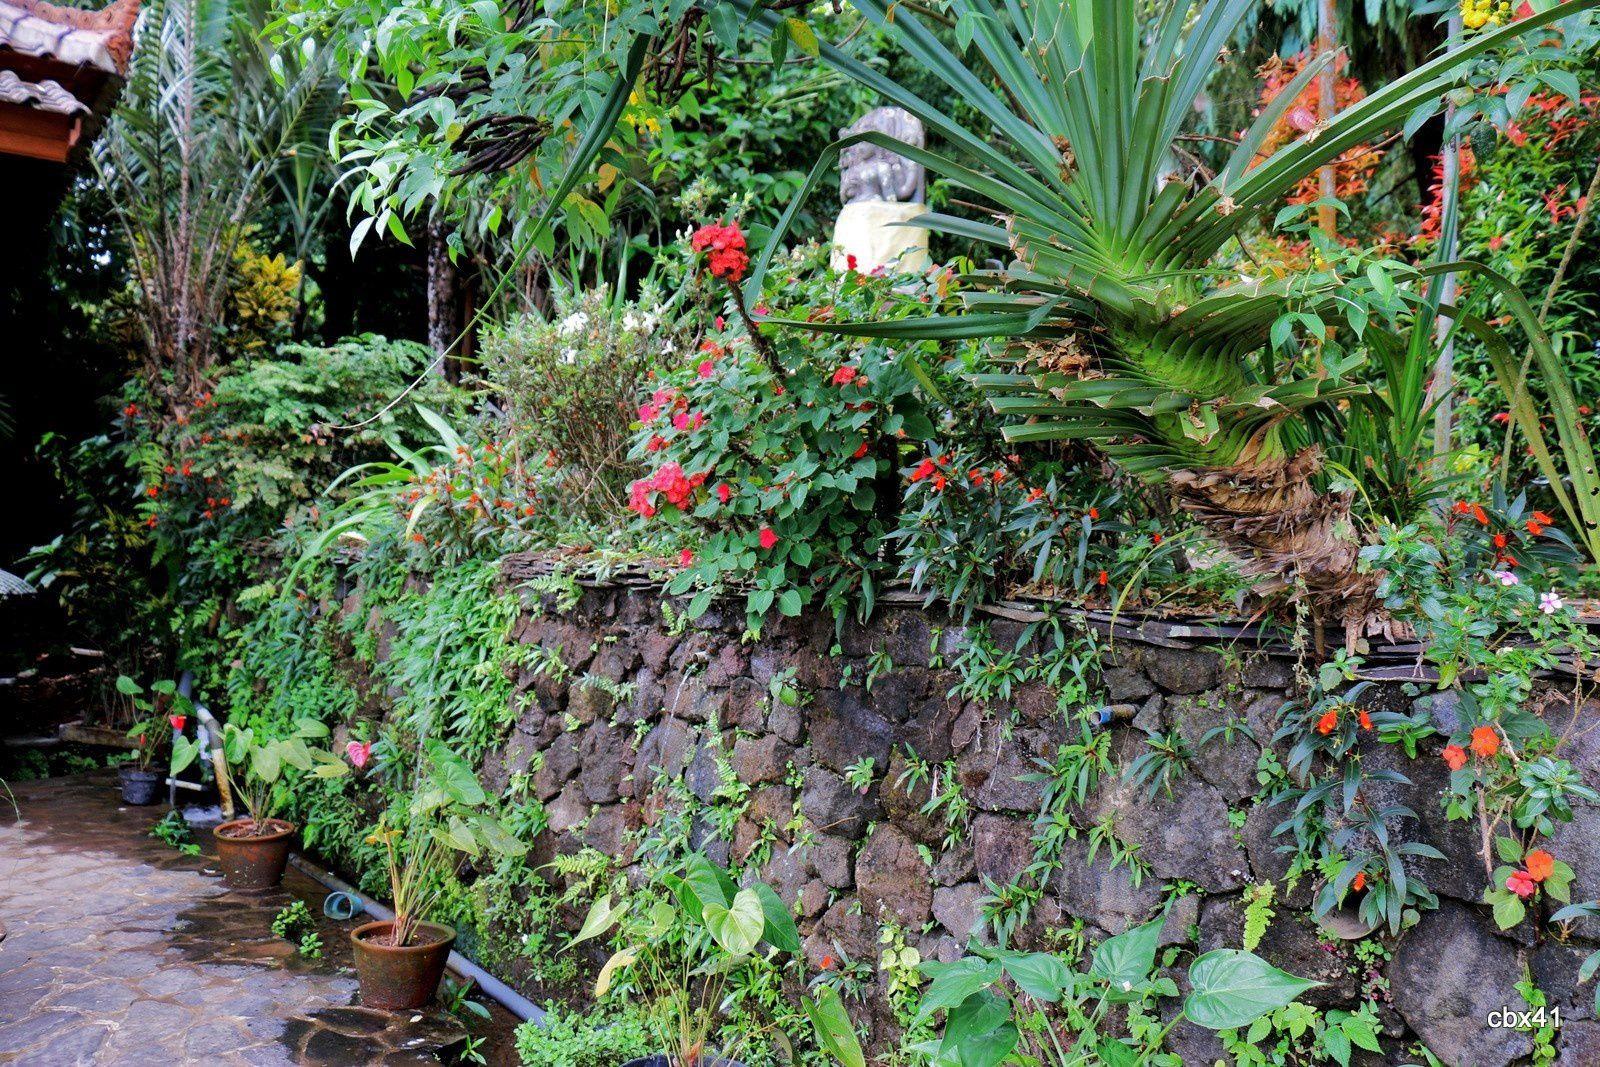 Taman Puri (Bali), statues